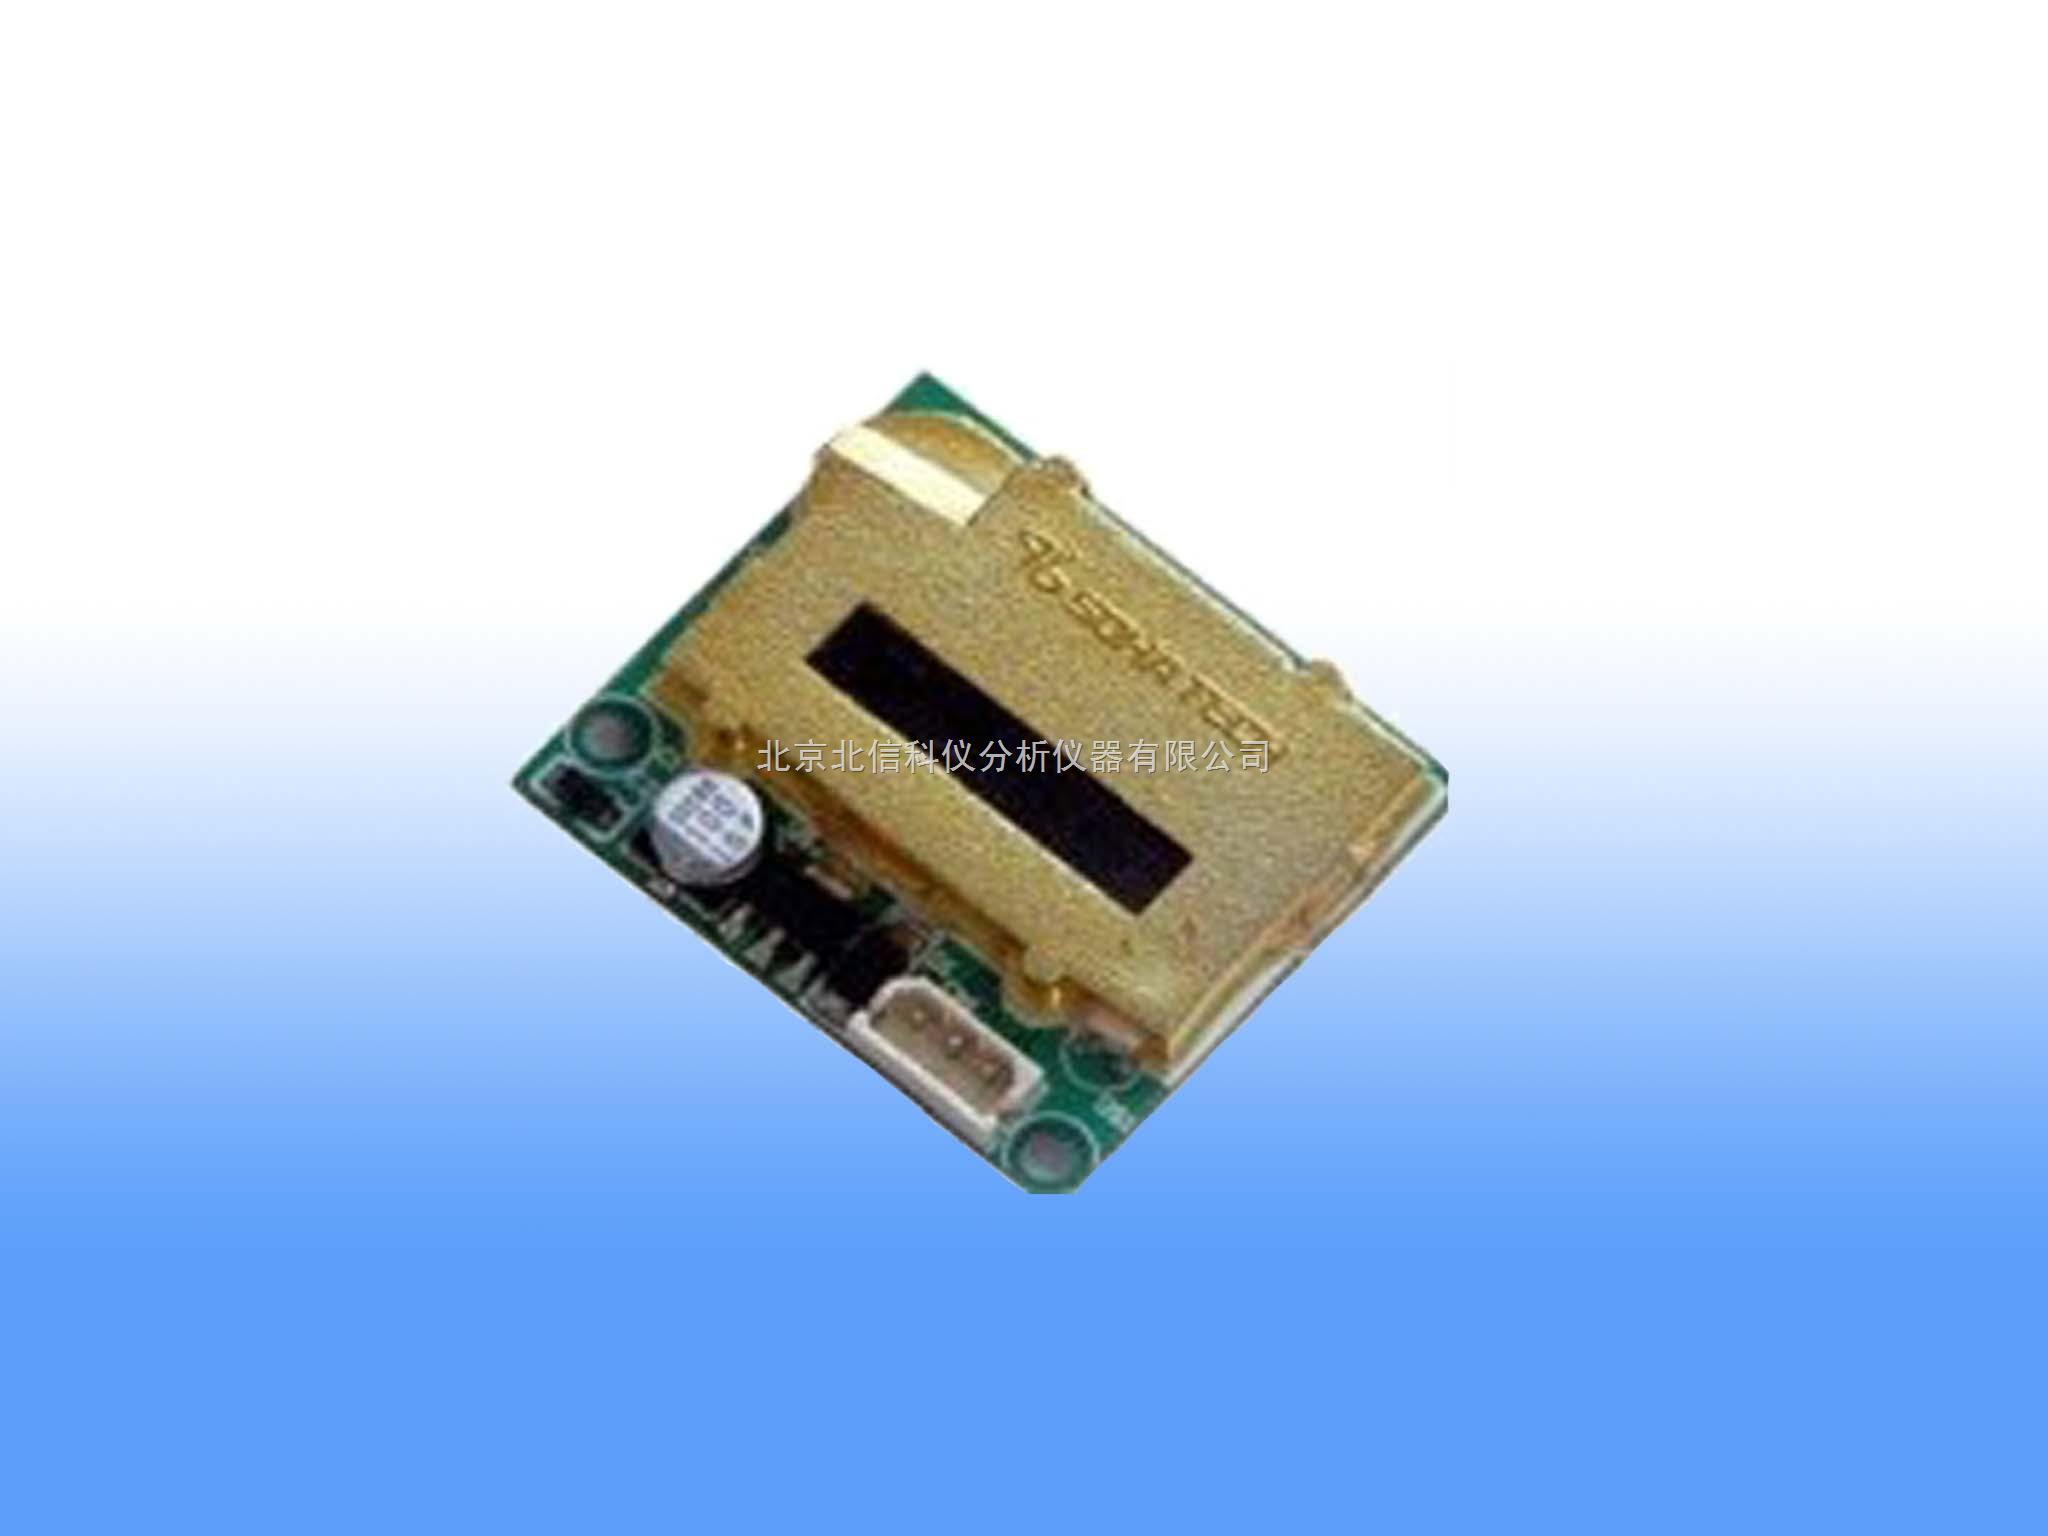 QT21-TM-EY-二氧化碳傳感器 雙光束紅外二氧化碳傳感器 二氧化碳氣體監測儀 室內空氣質量檢測儀